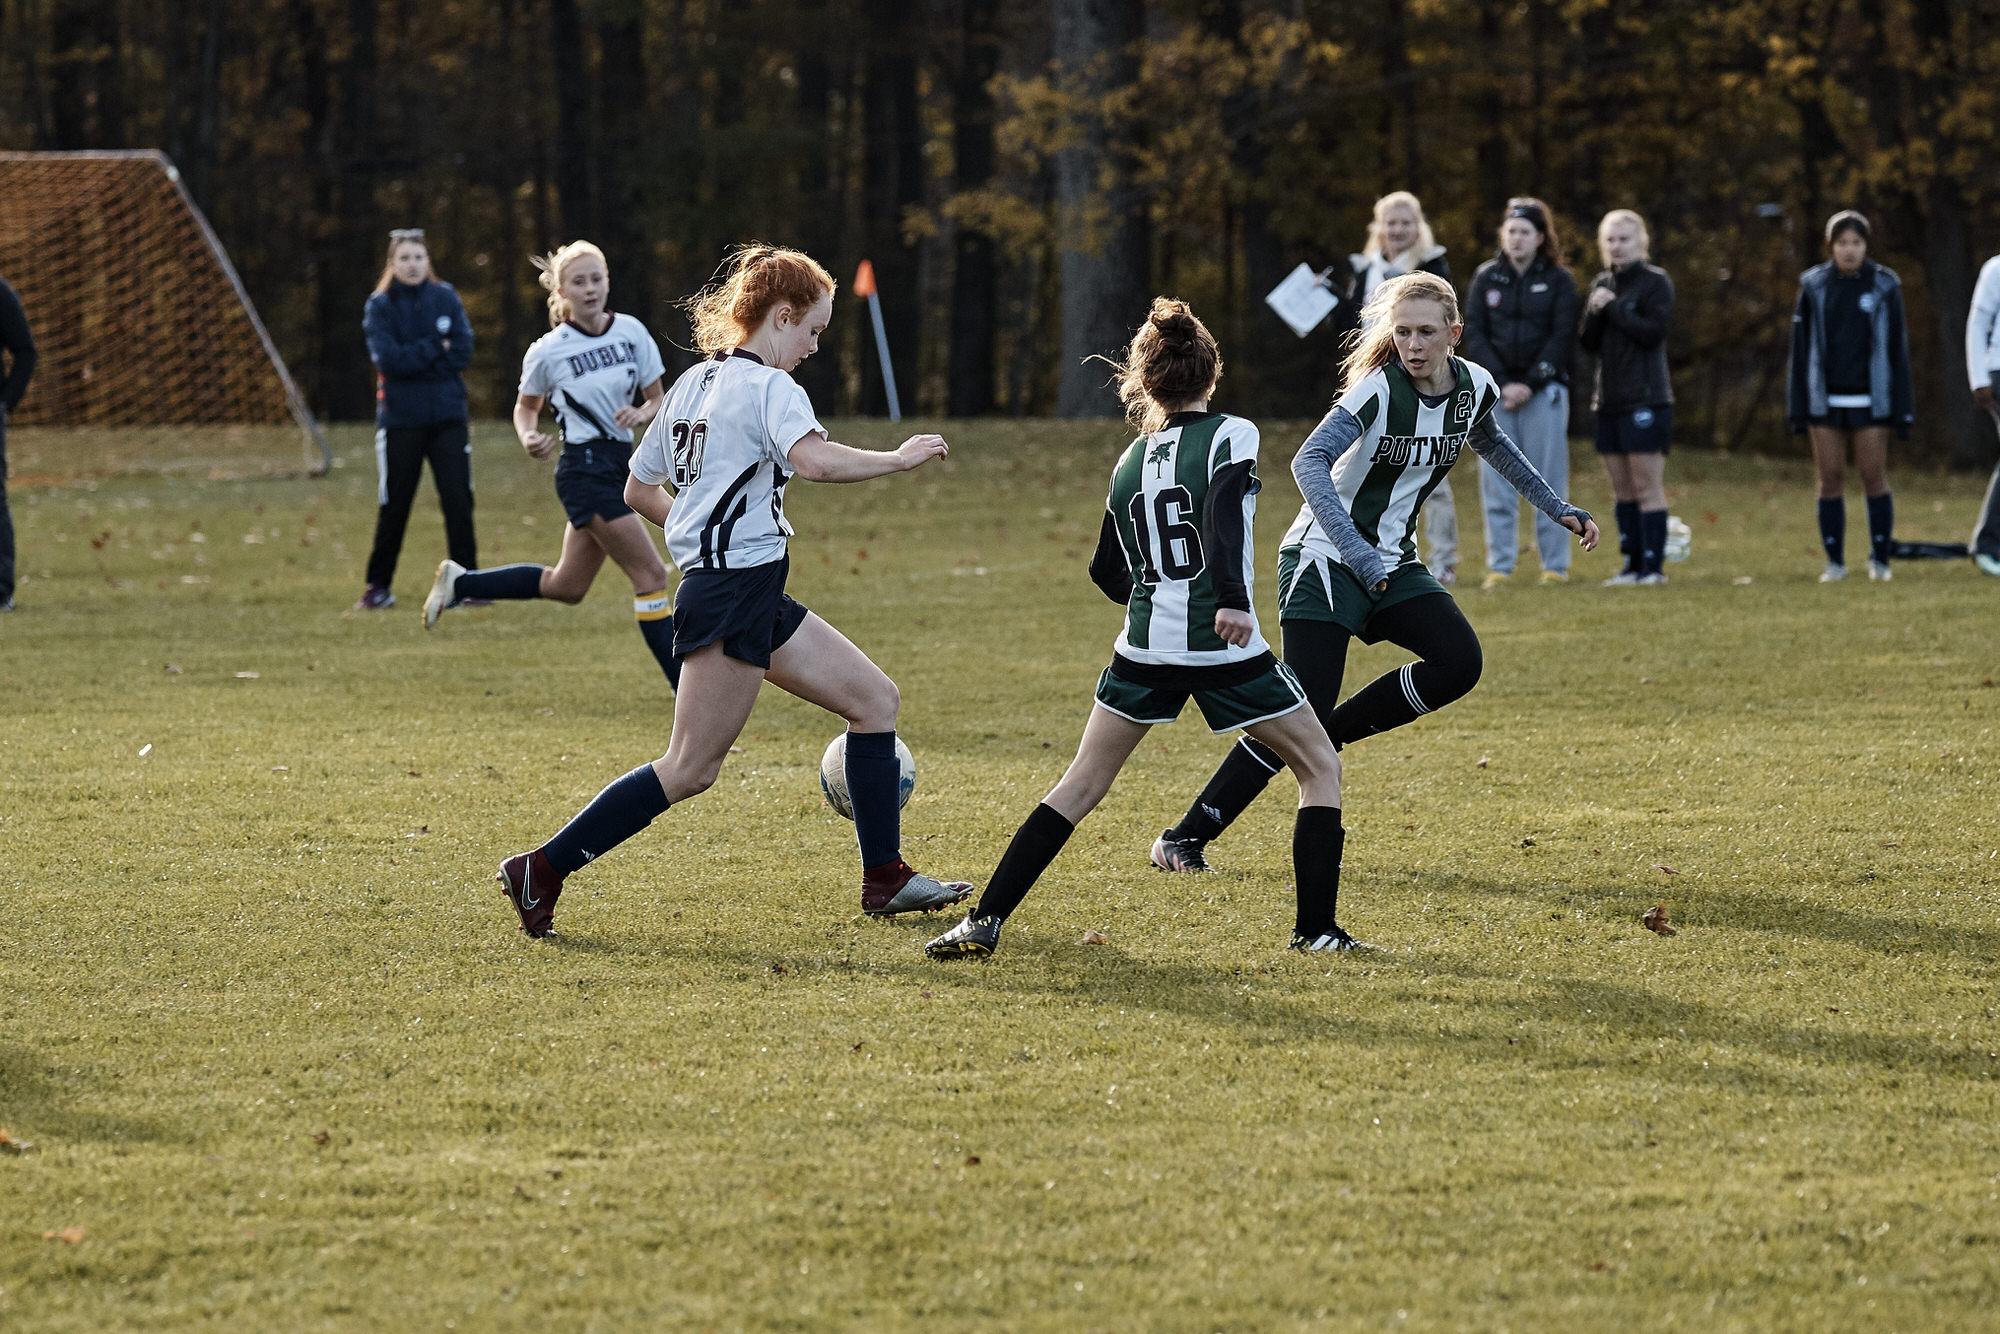 Girls Varsity Soccer vs. Putney School - October 26, 2018 - 047.jpg